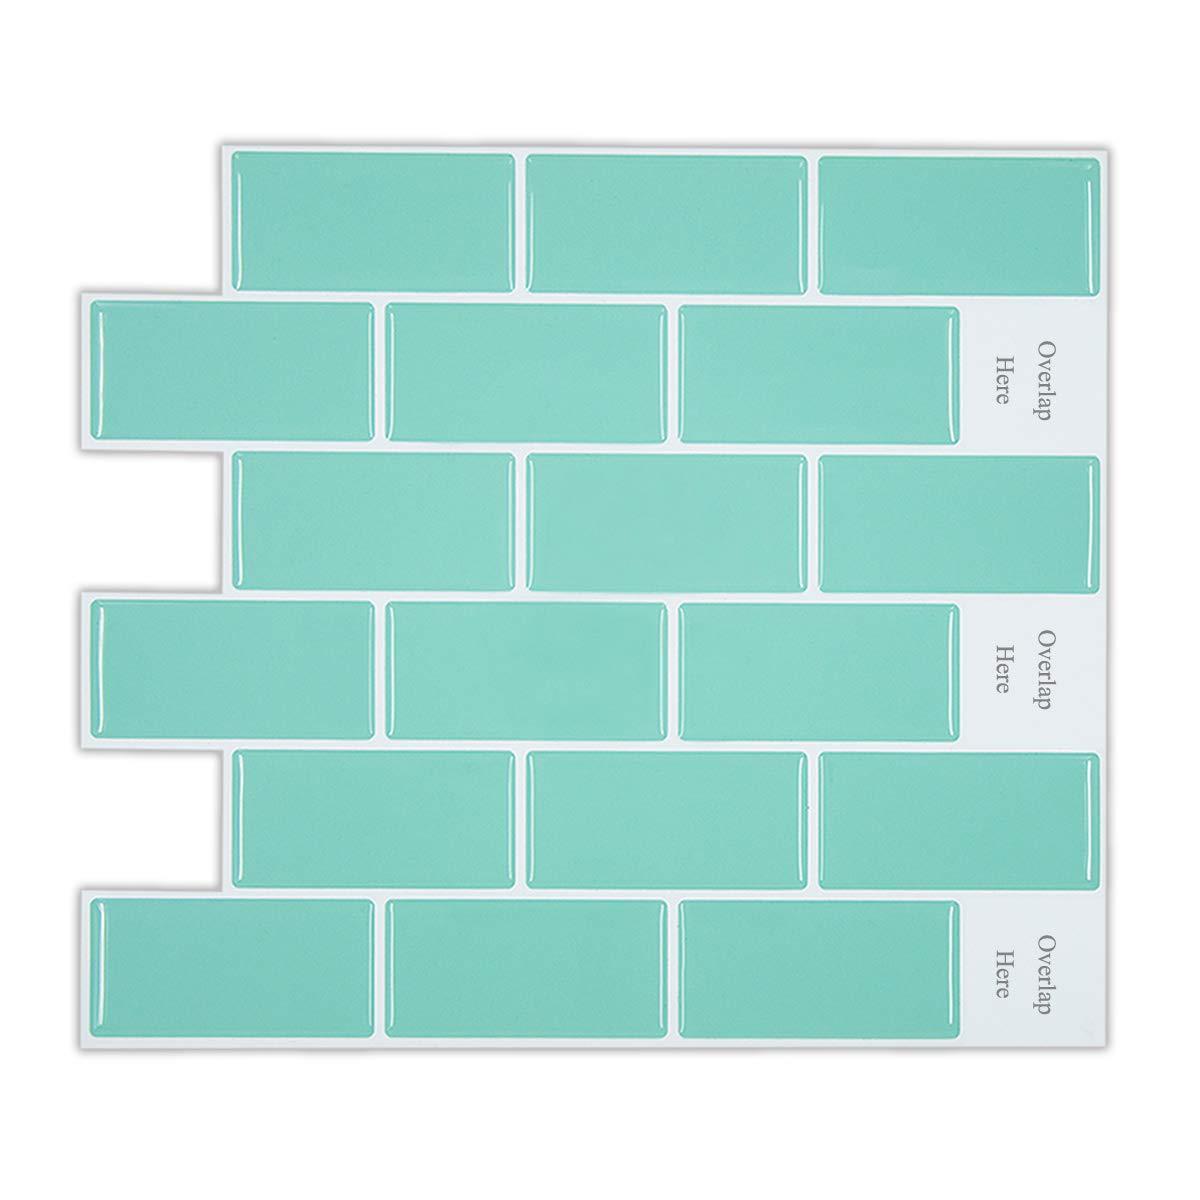 HUE DECORATION Peel and Stick Subway Tile Backsplash for Kitchen, Anti Mold Aqua Backsplash Tile 11.26'' x 10'' Pack of 6